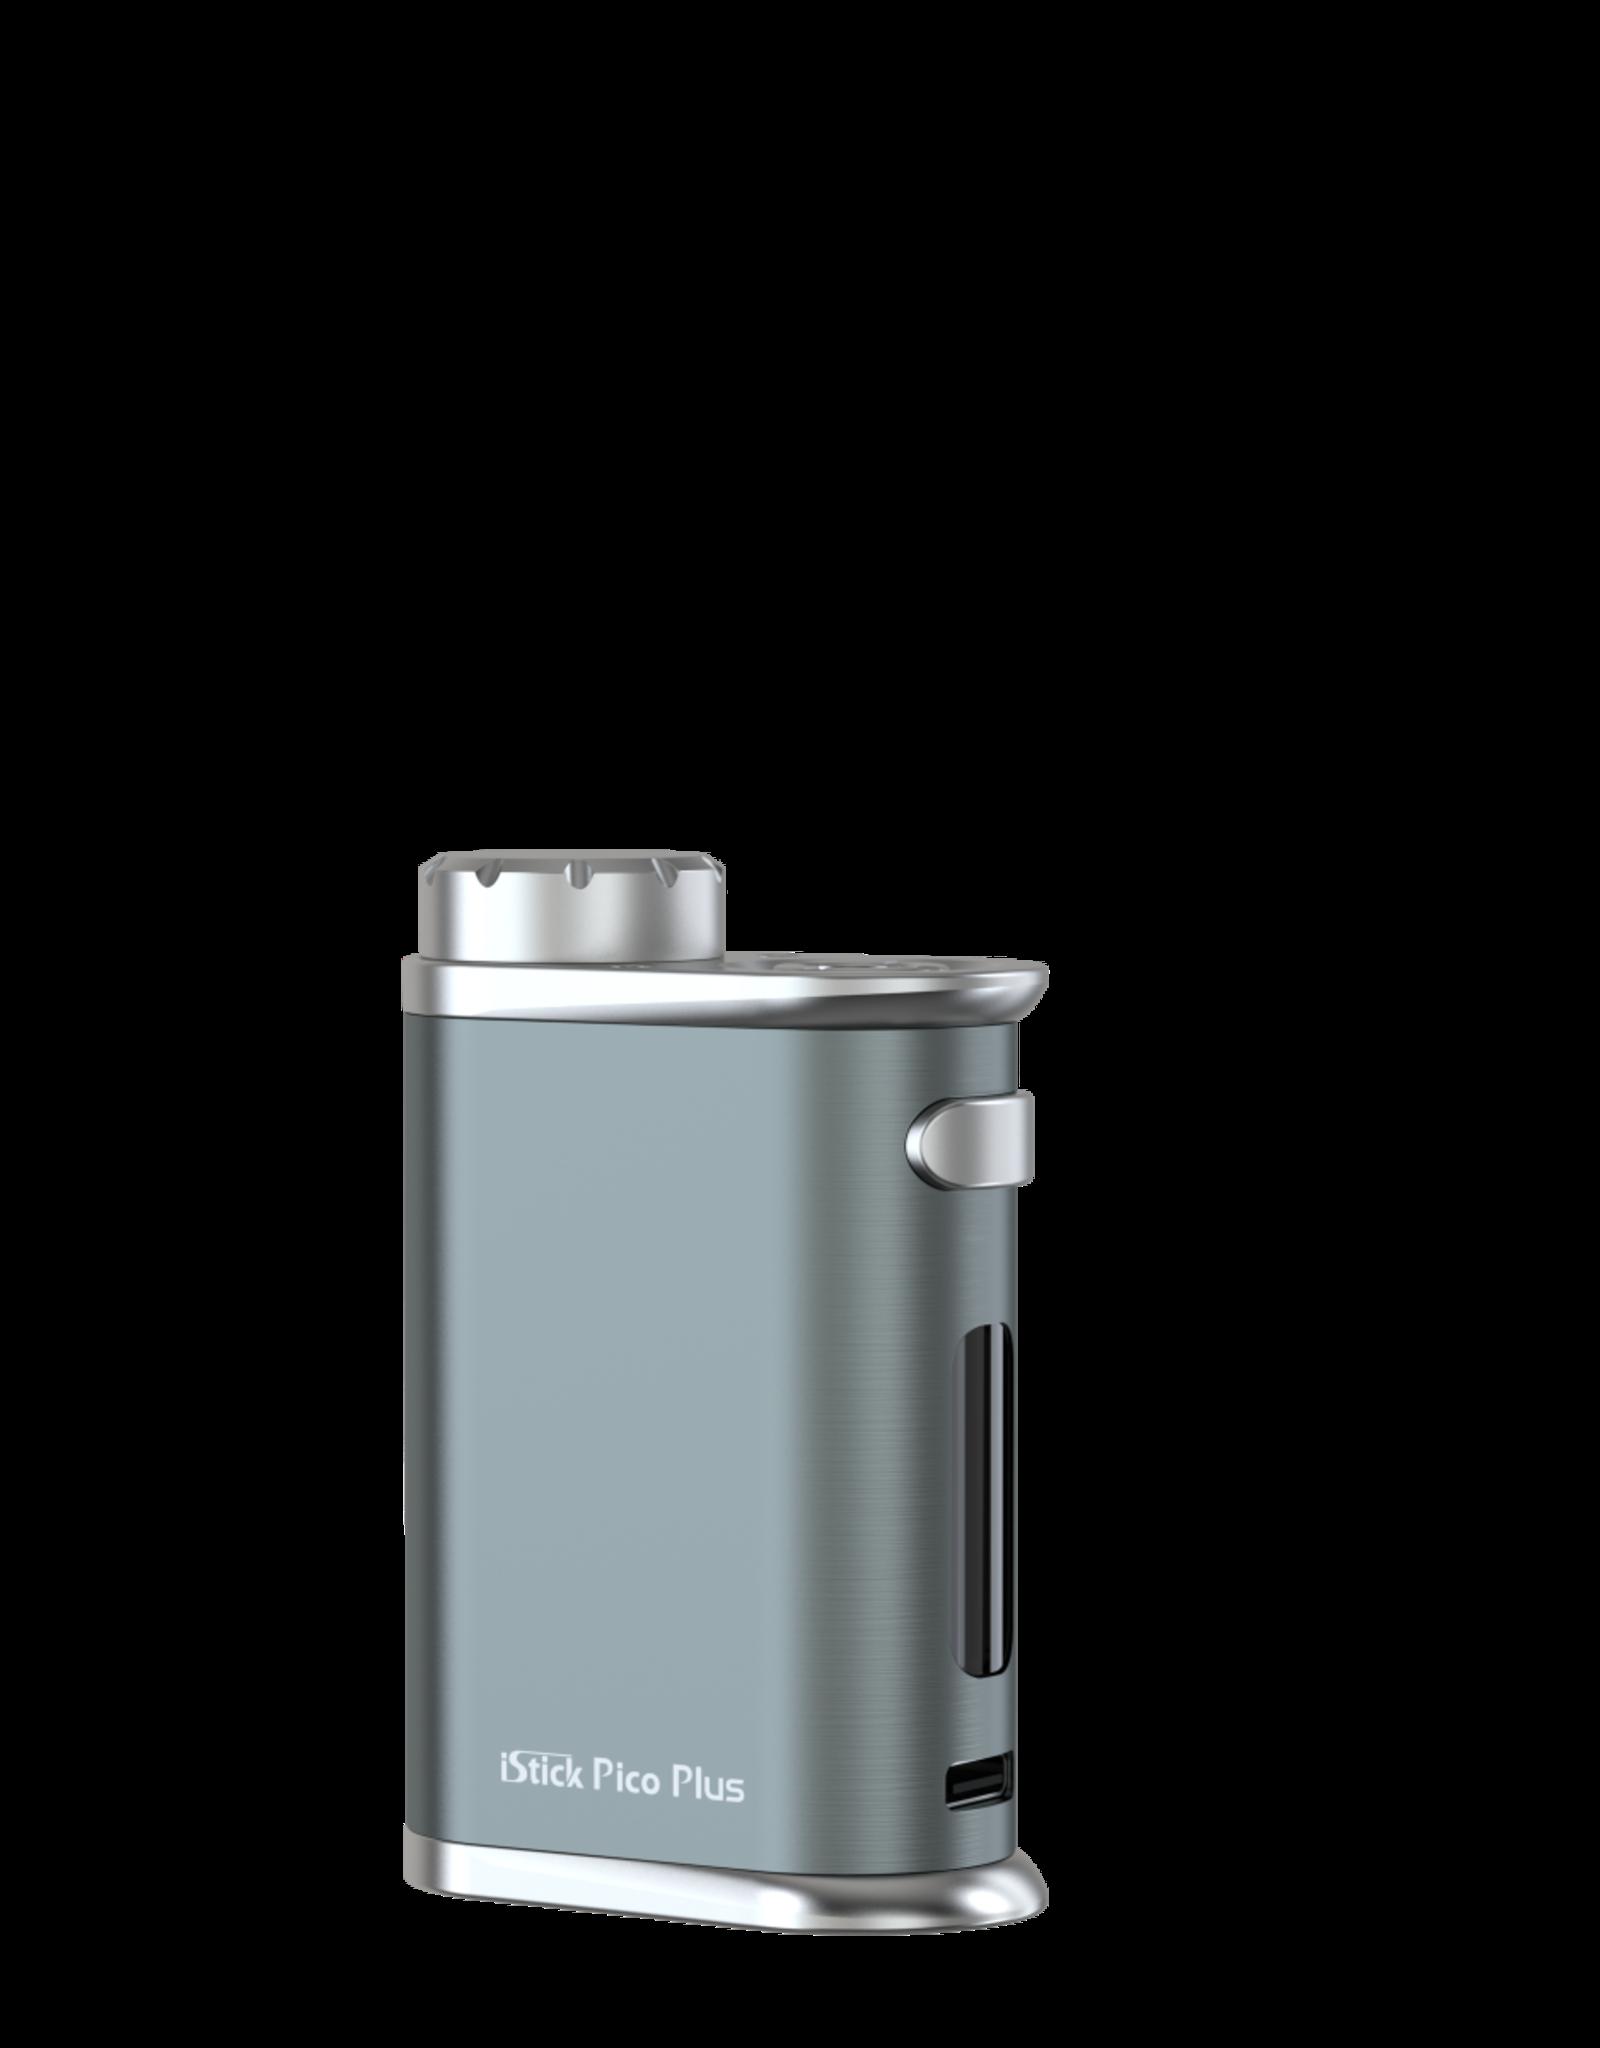 eLeaf Eleaf iStick Pico Plus Mod